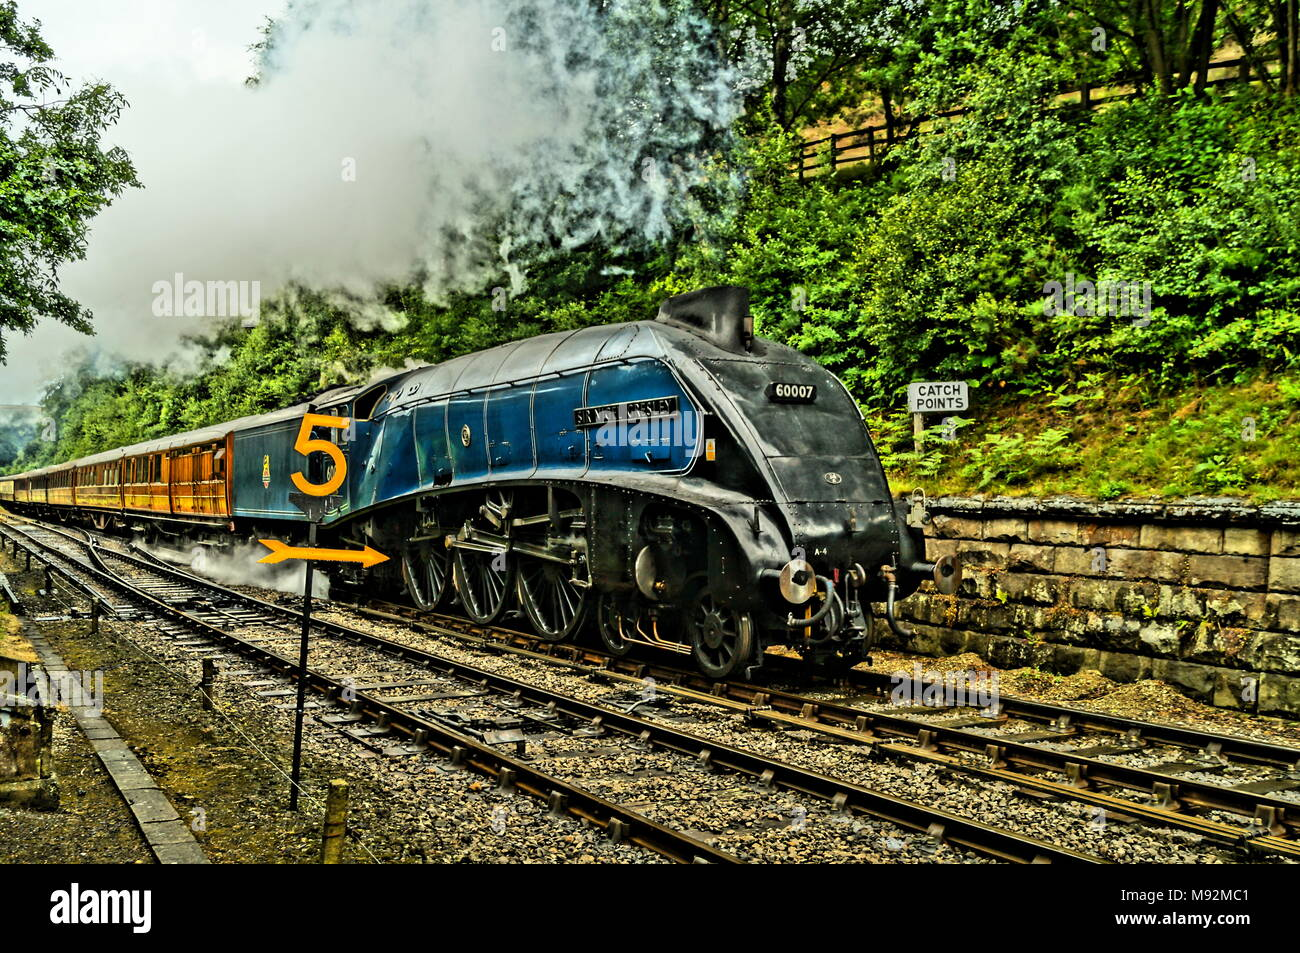 Post War Steam train world speed record holder Sir Nigel Gresley Steam train heading to Goathland Station - Stock Image